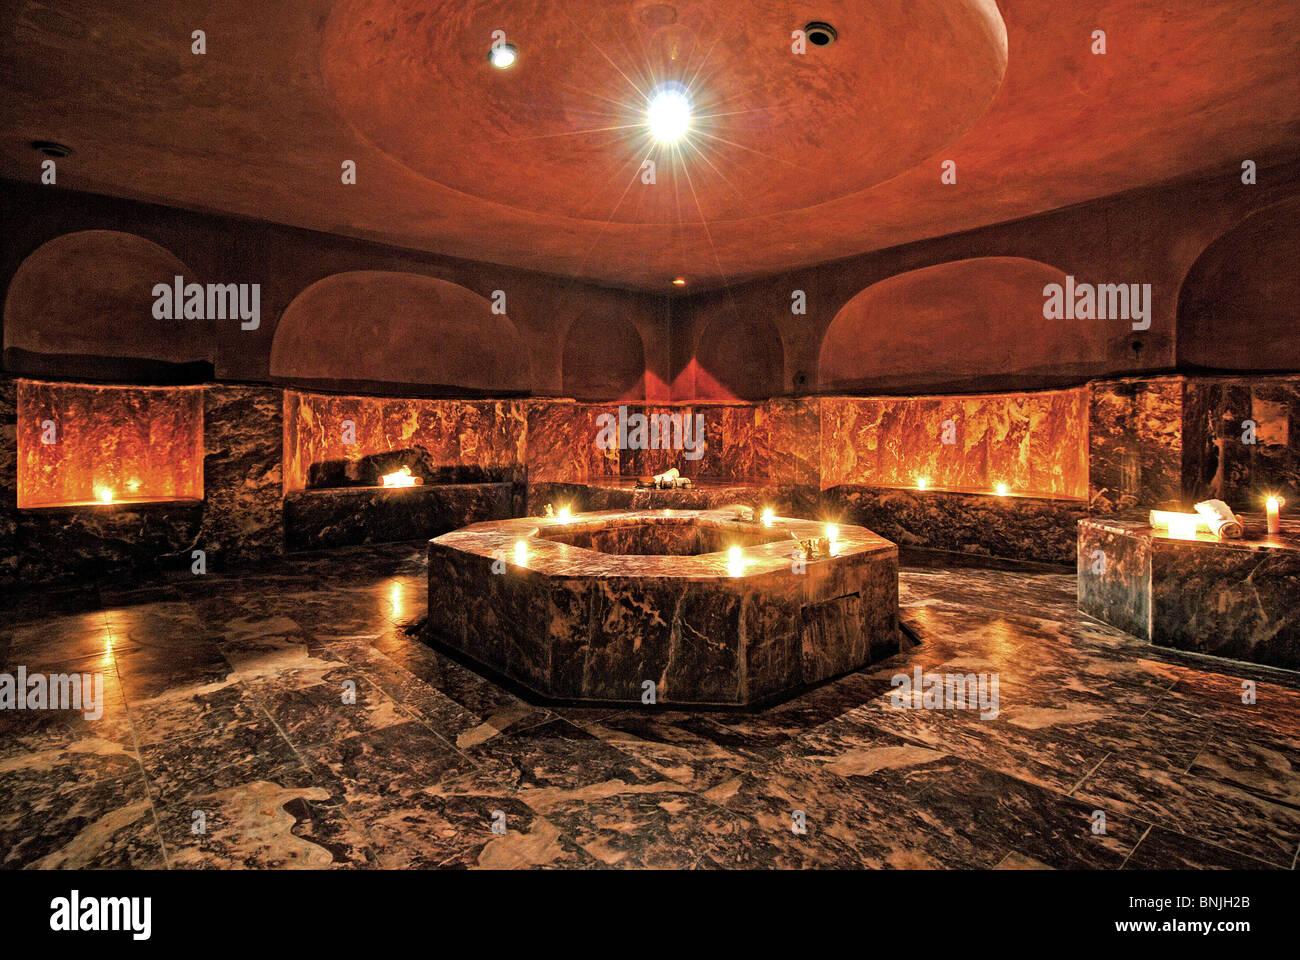 morocco marrakech hammam turkish bath steam bath spa. Black Bedroom Furniture Sets. Home Design Ideas